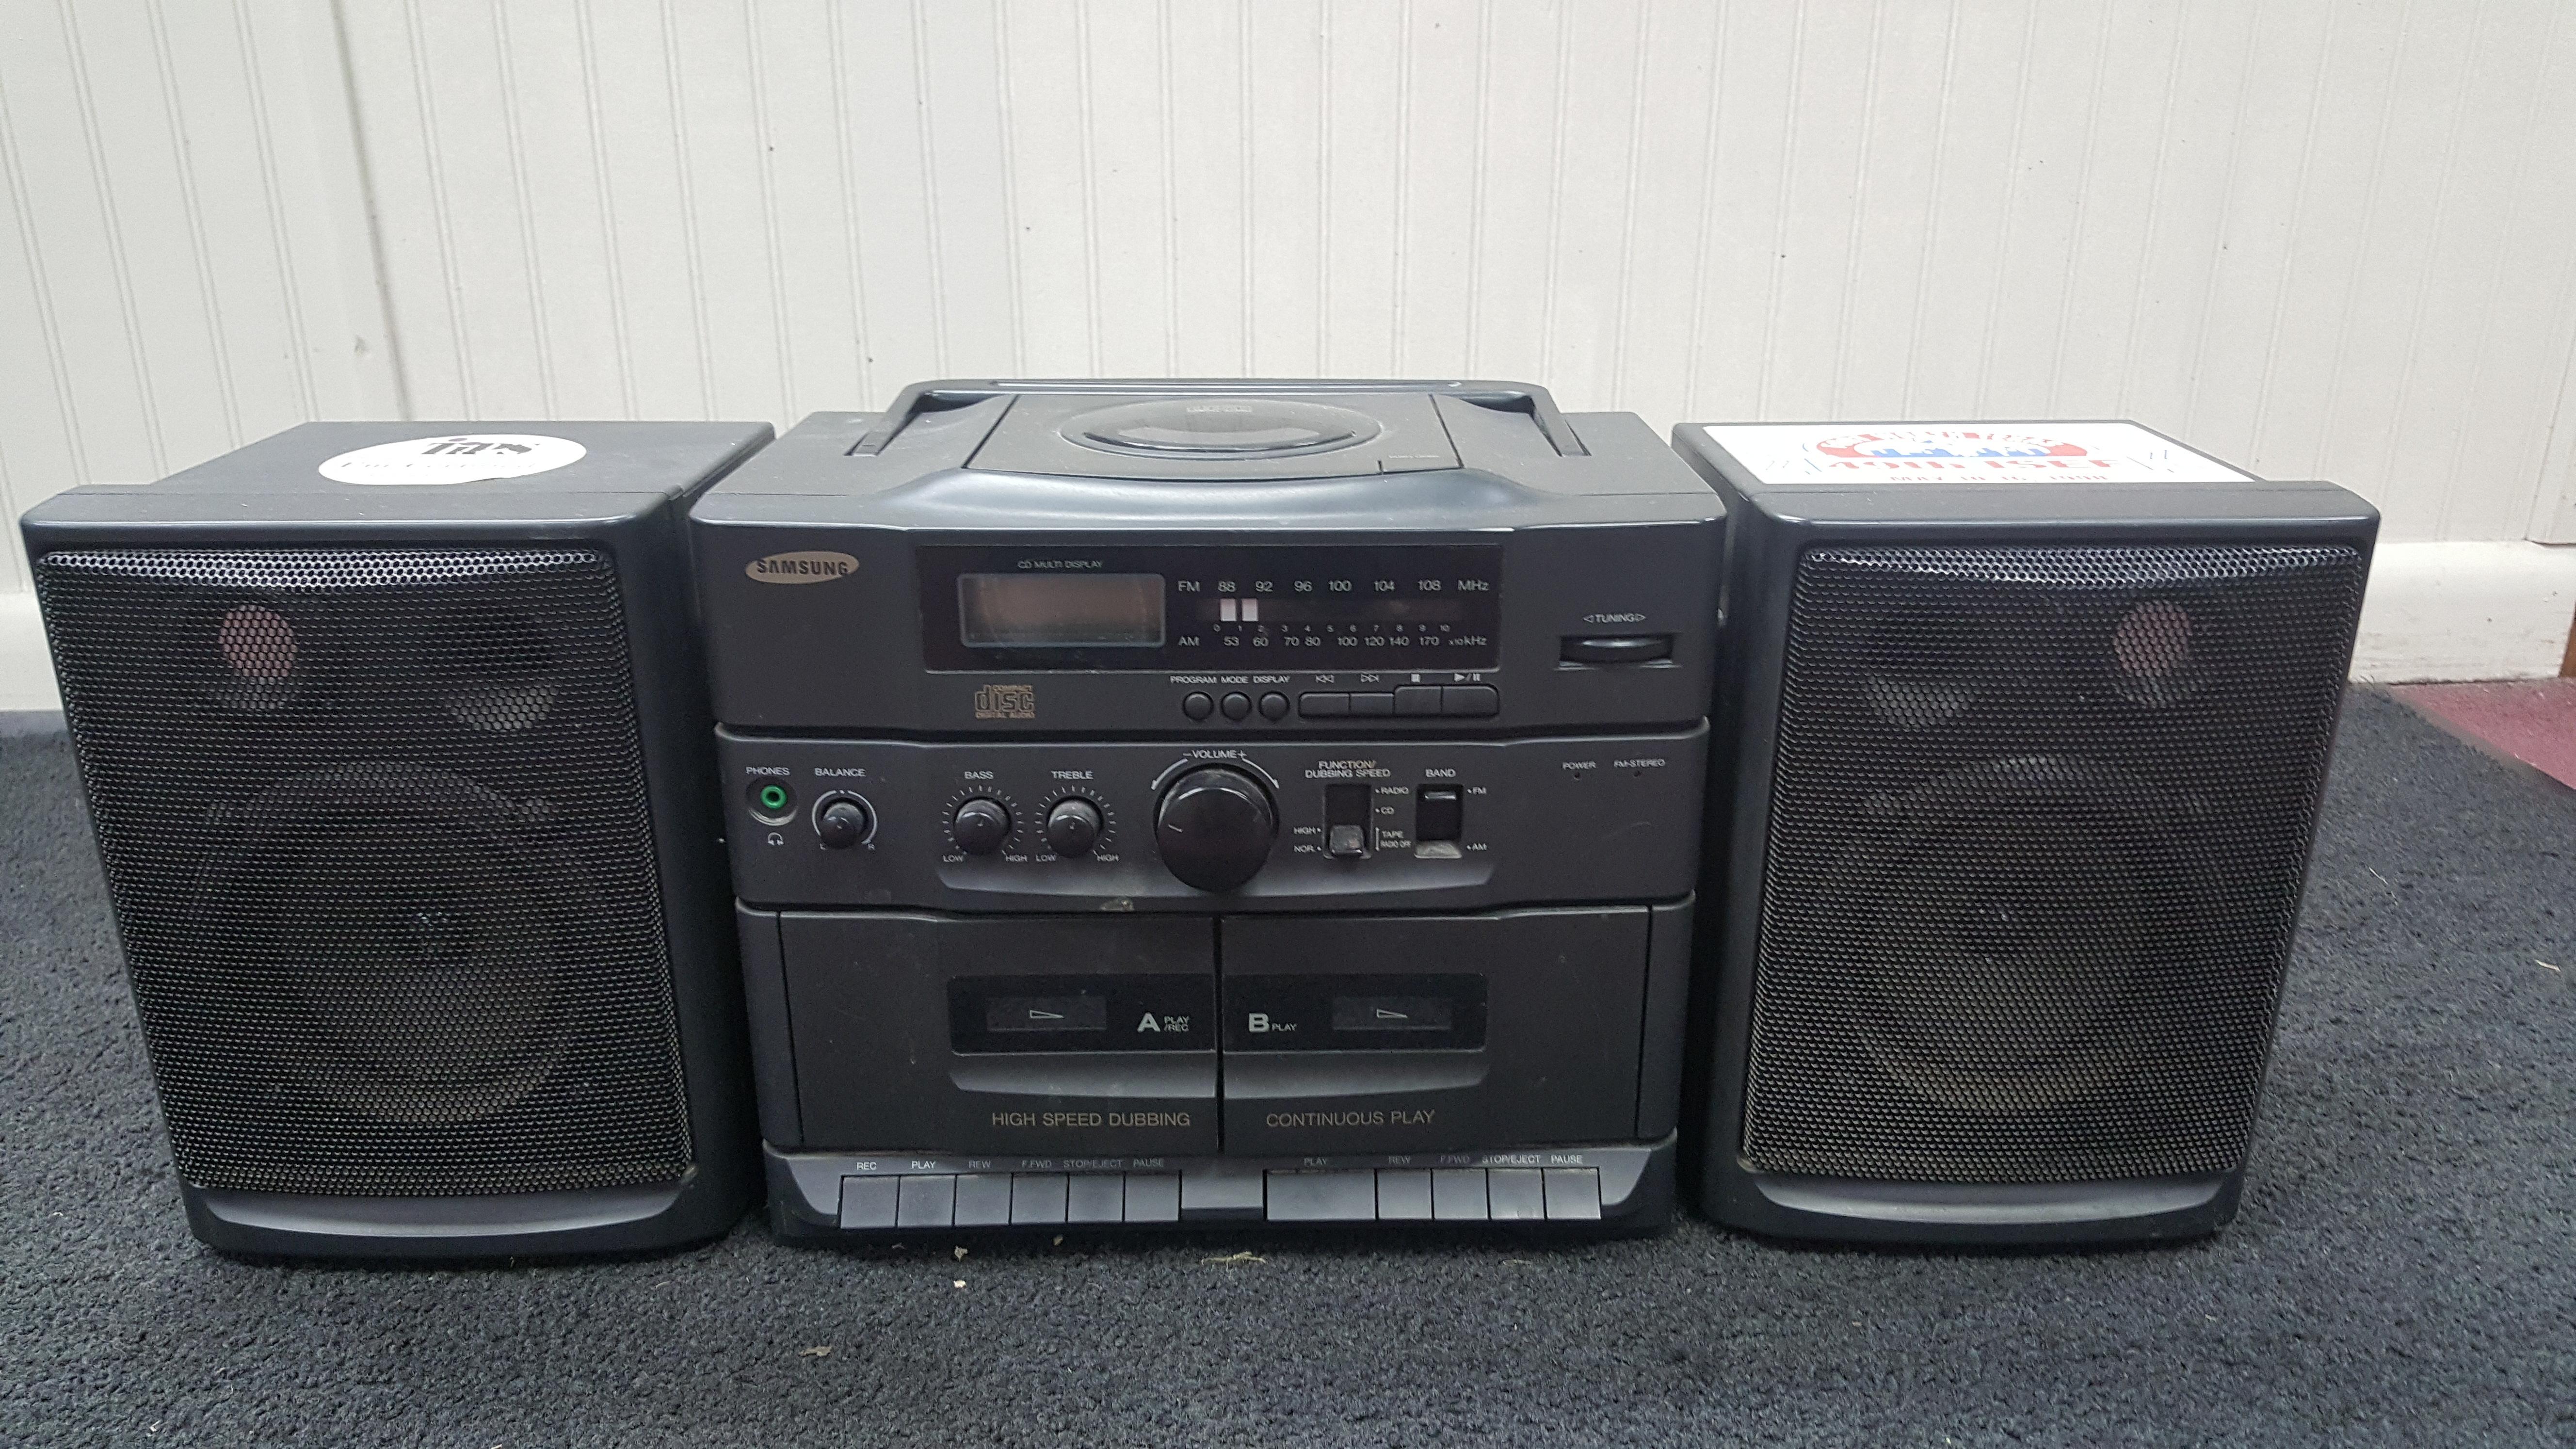 SAMSUNG PCD-720 N RADIO